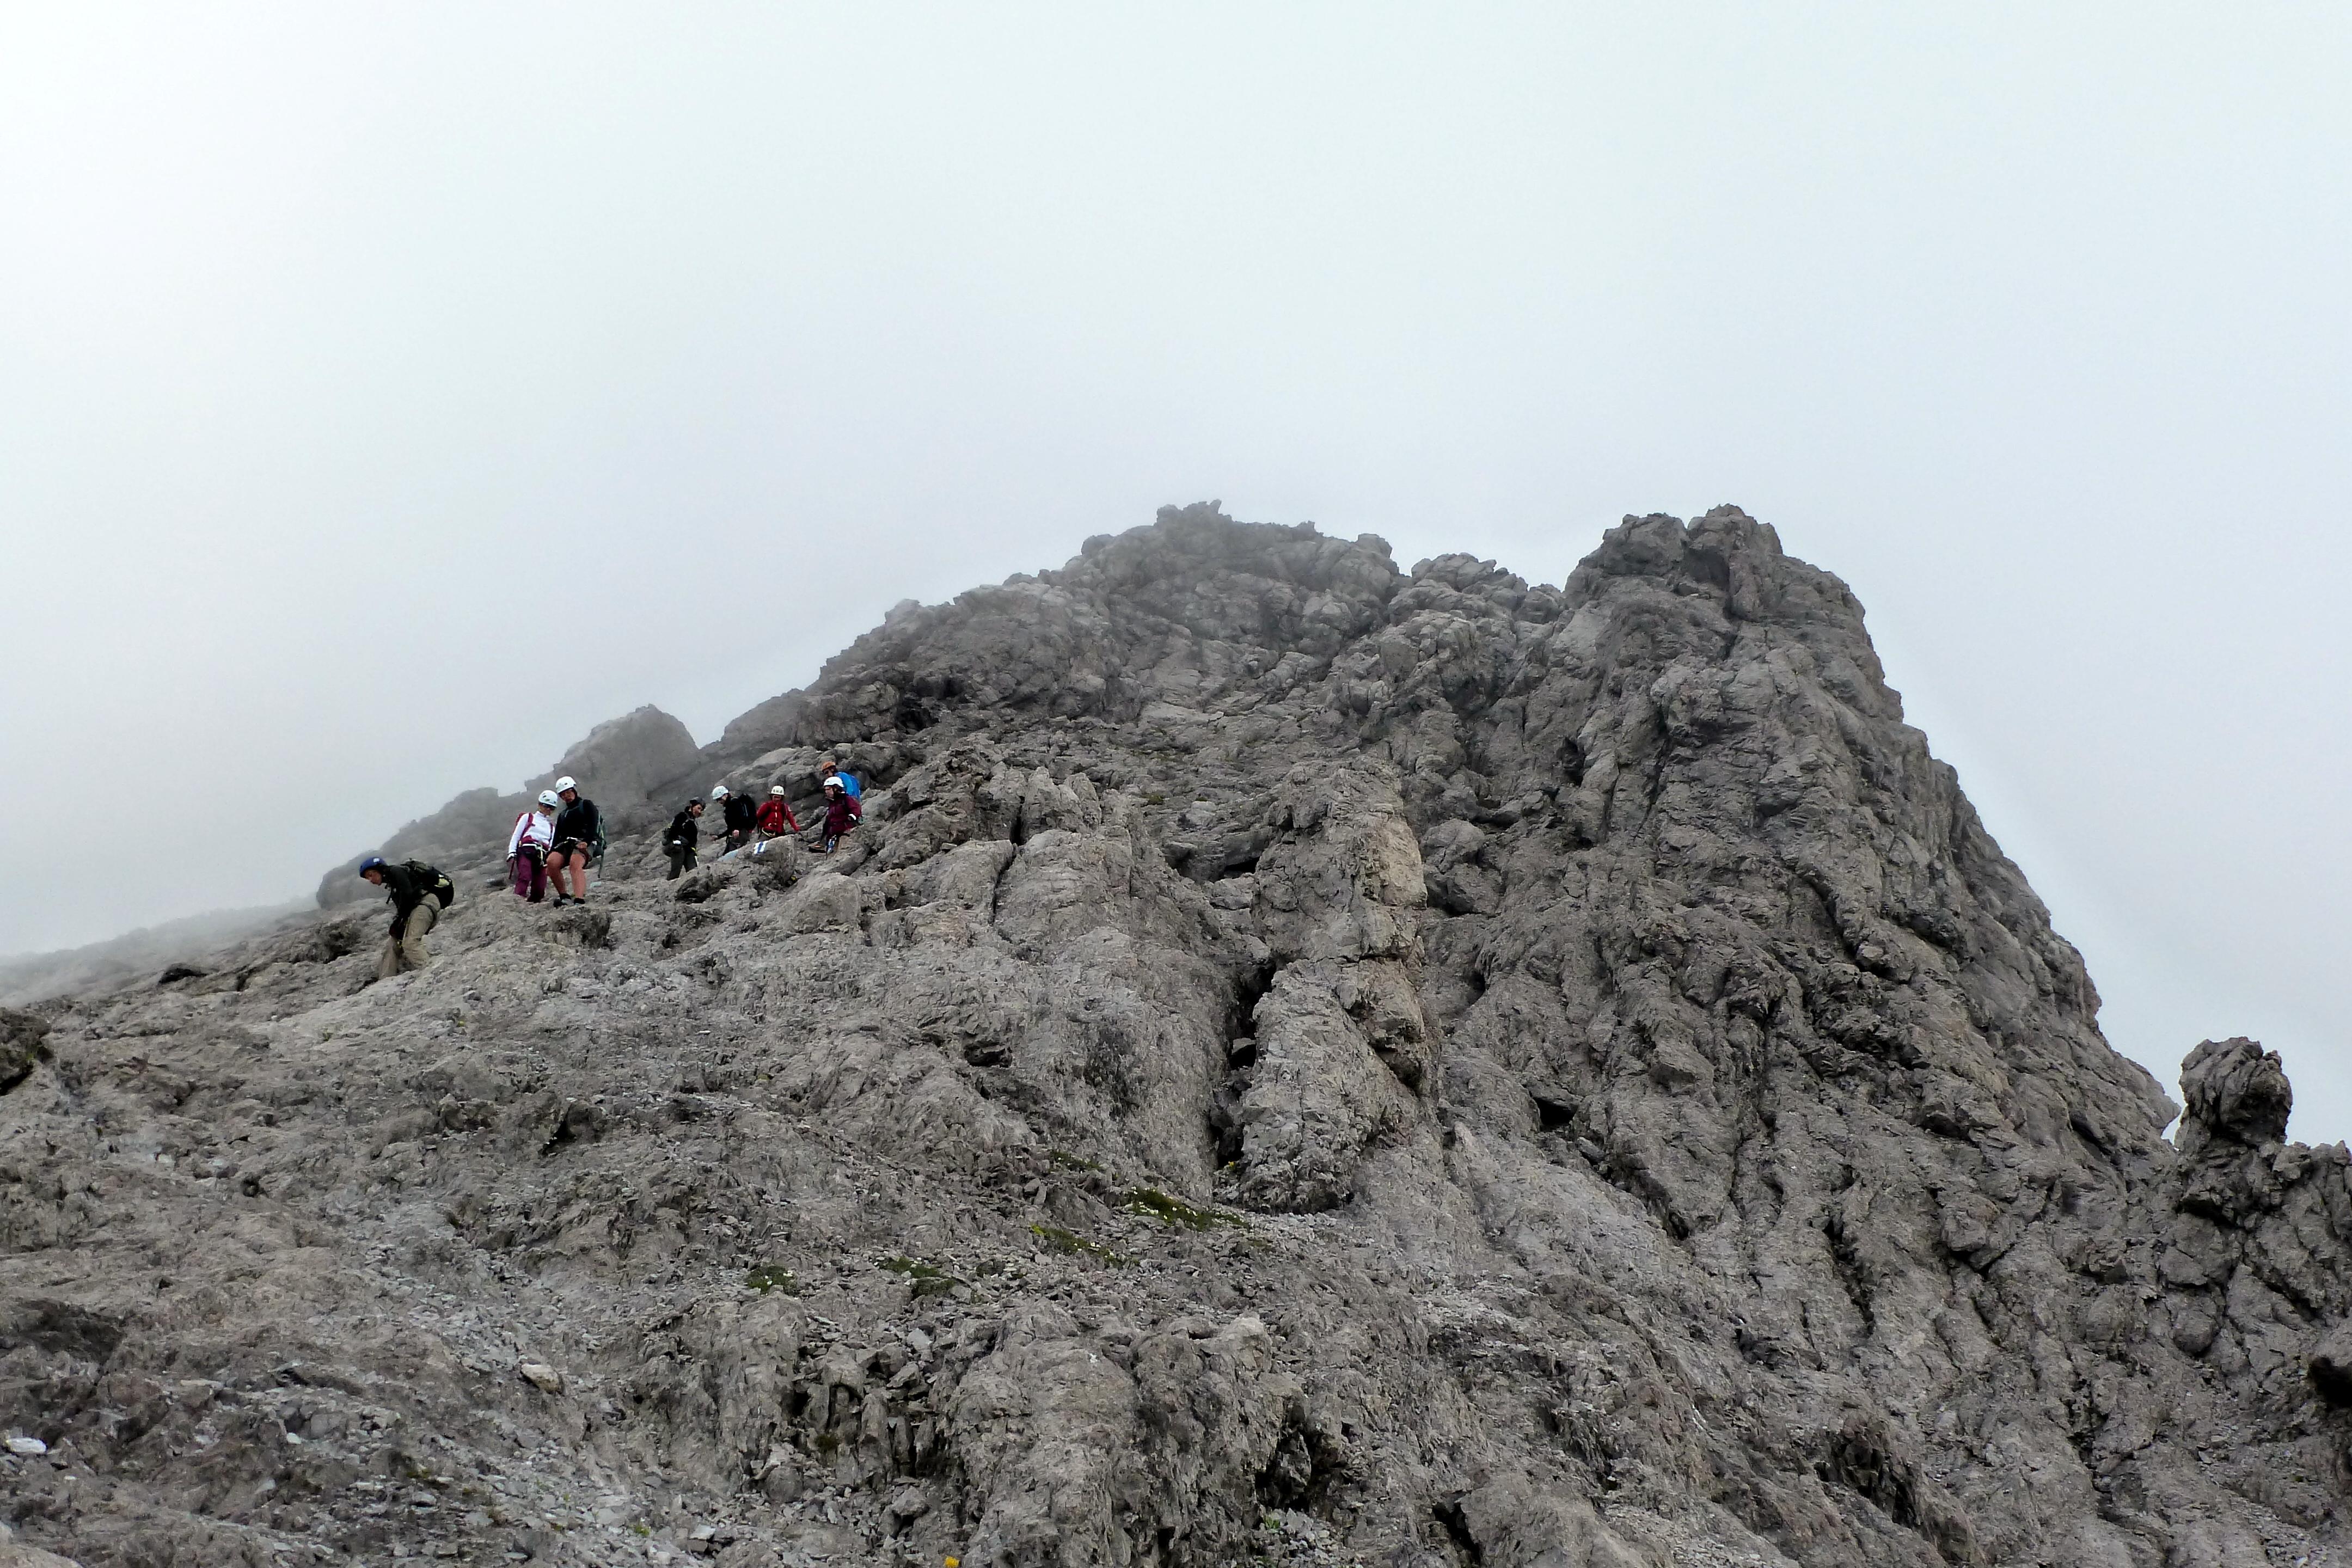 Klettersteig Saulakopf : Bilder vom saulakopf klettersteig im montafon patruckel